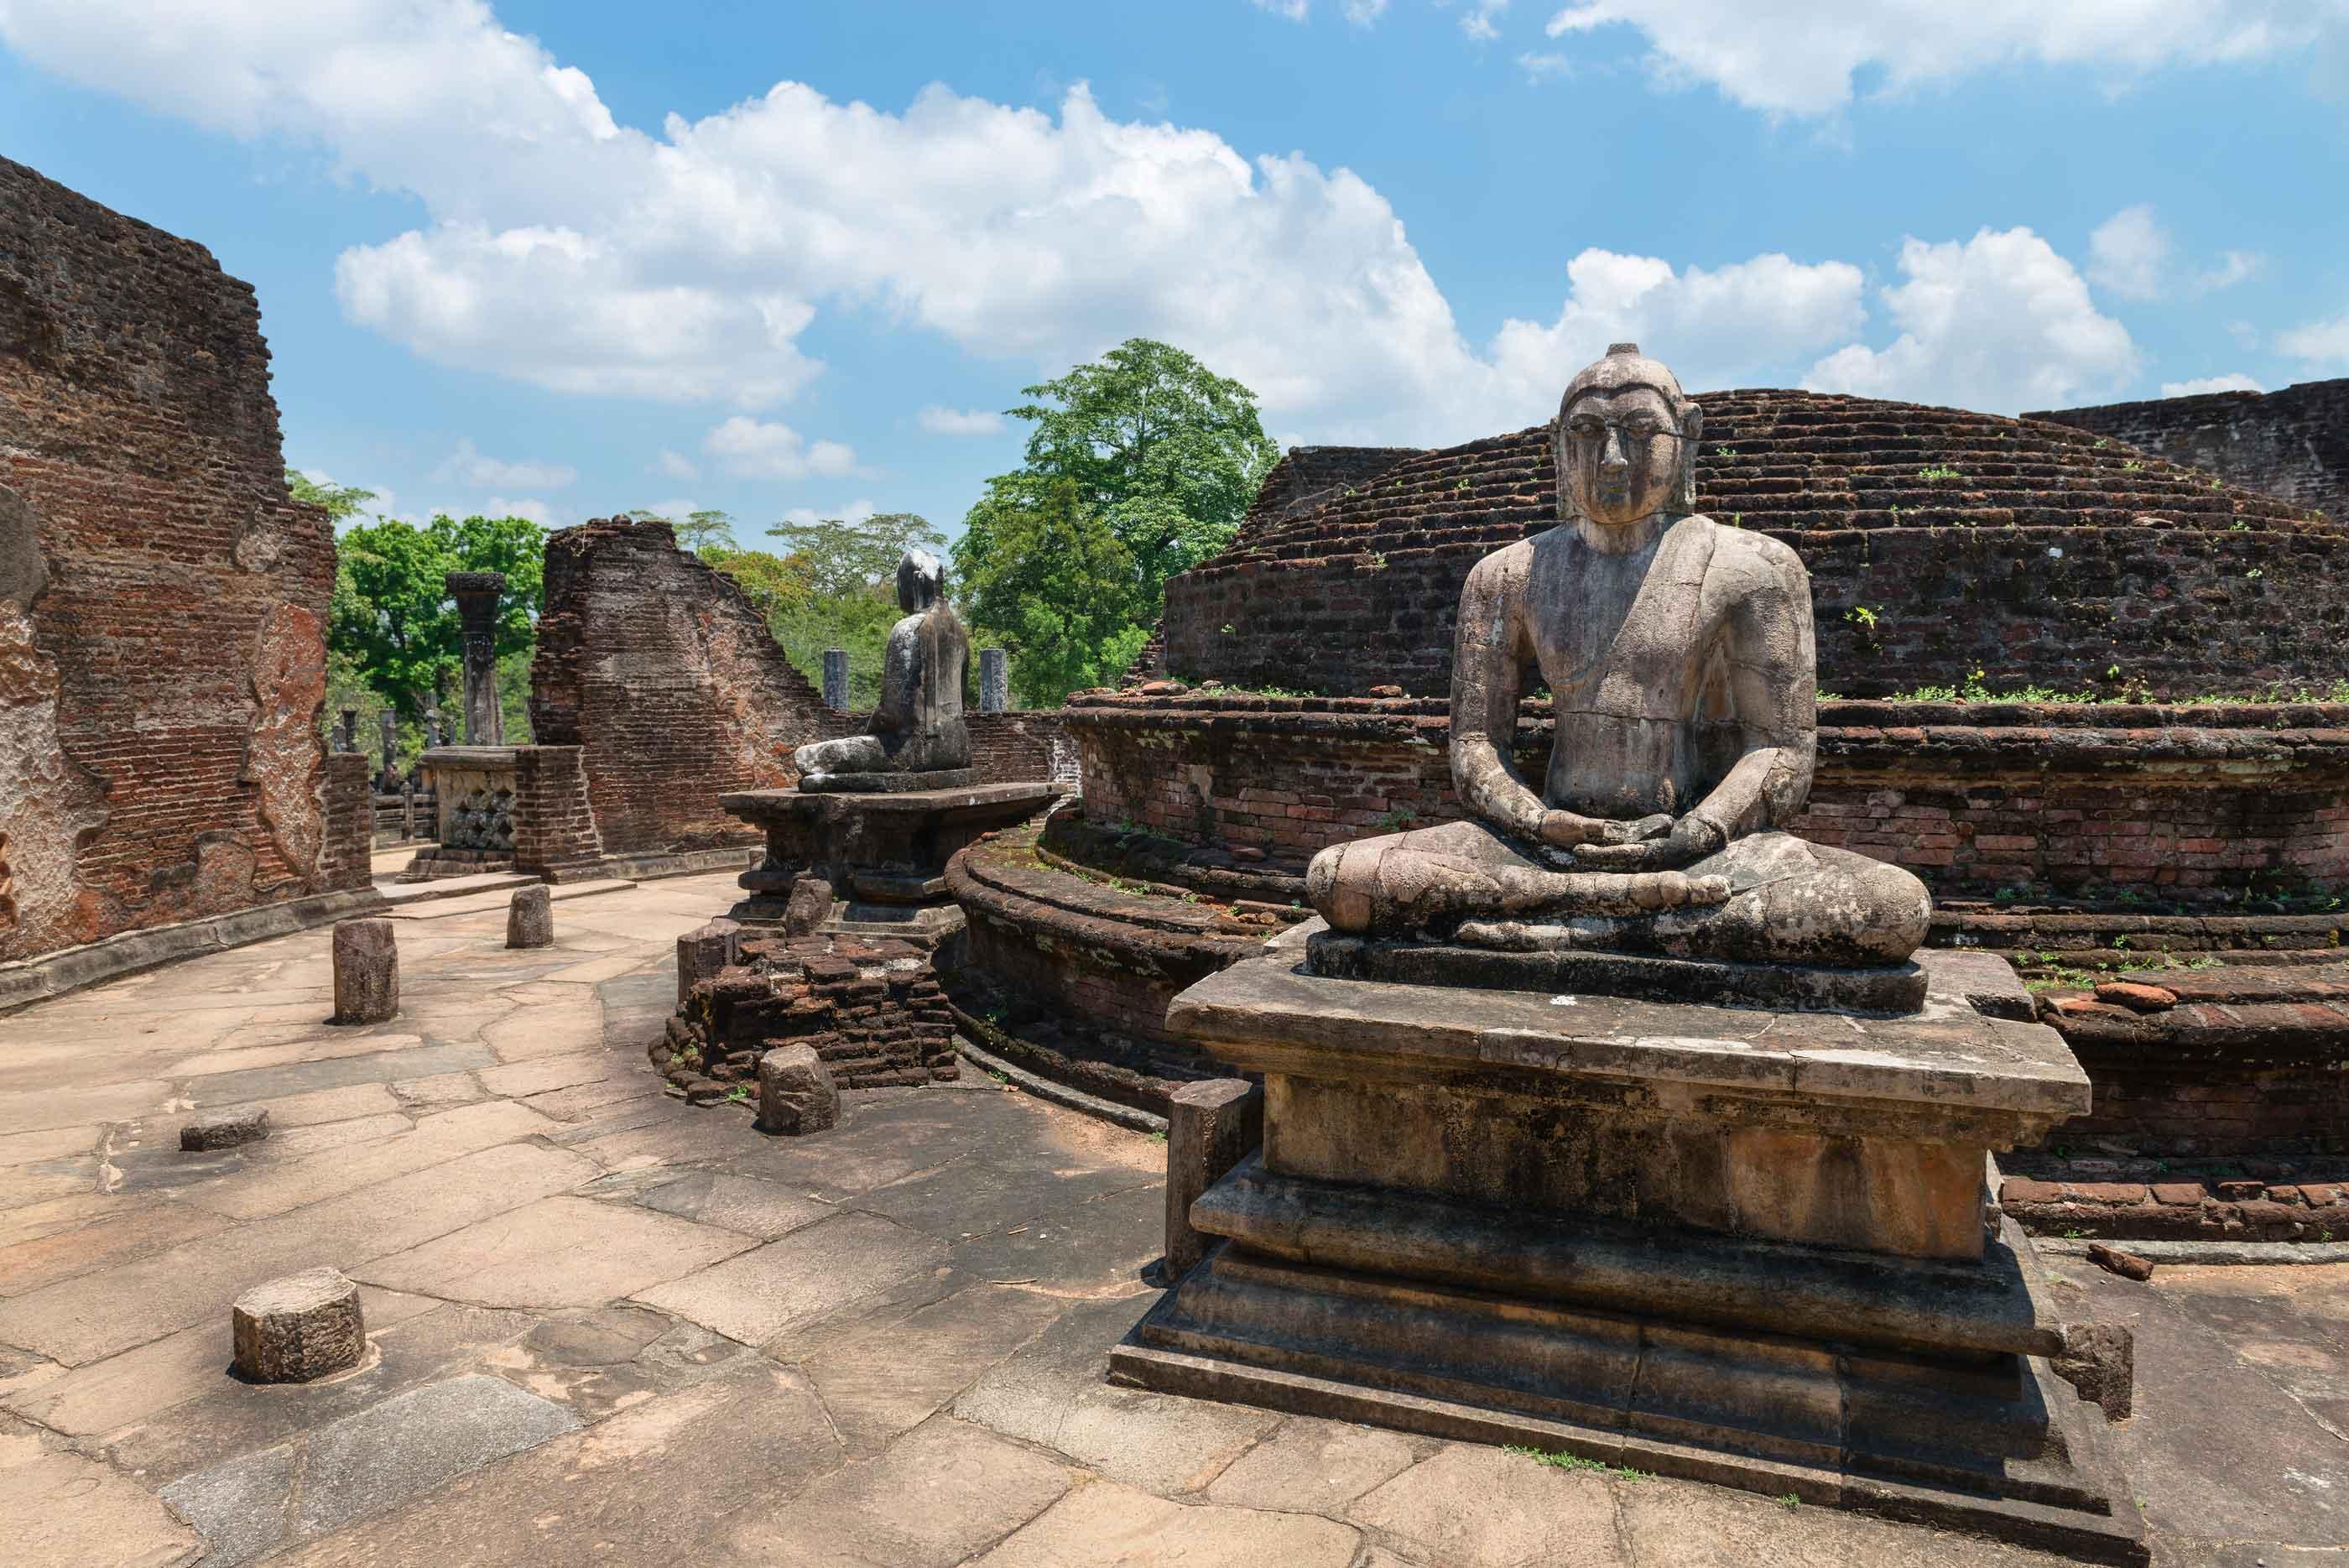 Скульптура Будды среди развалин в Анурадхапуре